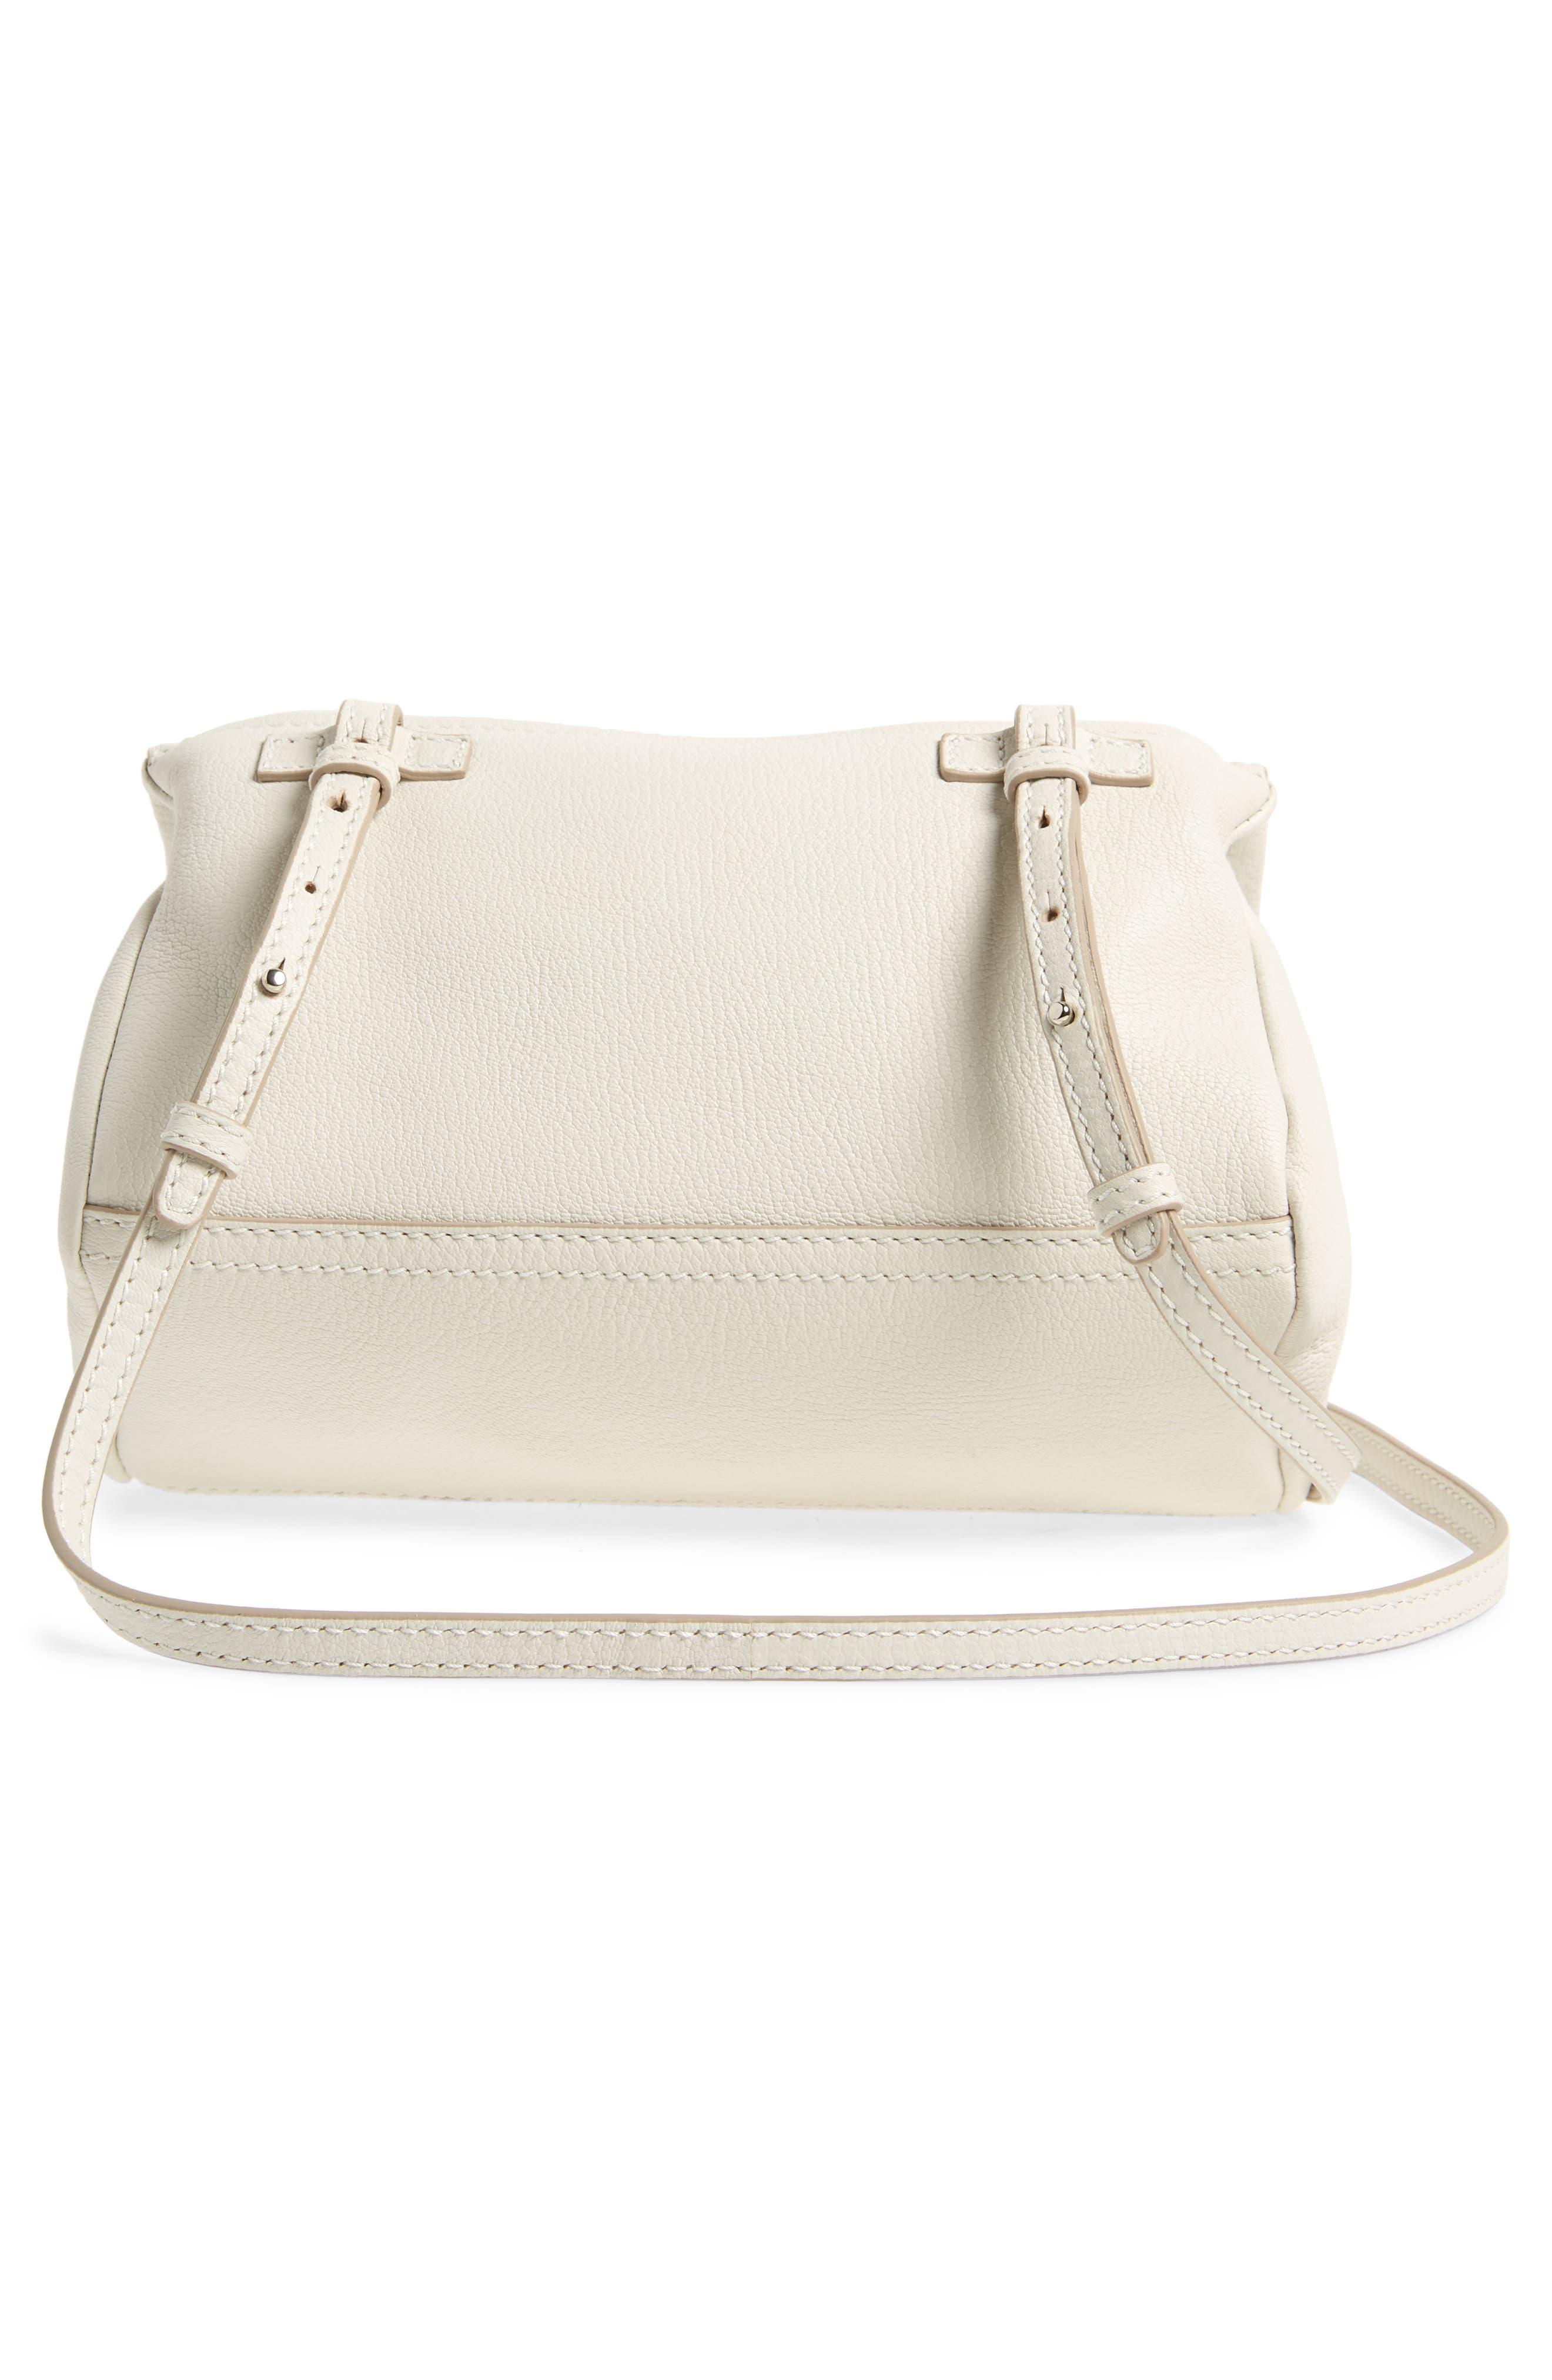 'Mini Pandora' Sugar Leather Shoulder Bag,                             Alternate thumbnail 3, color,                             WHITE